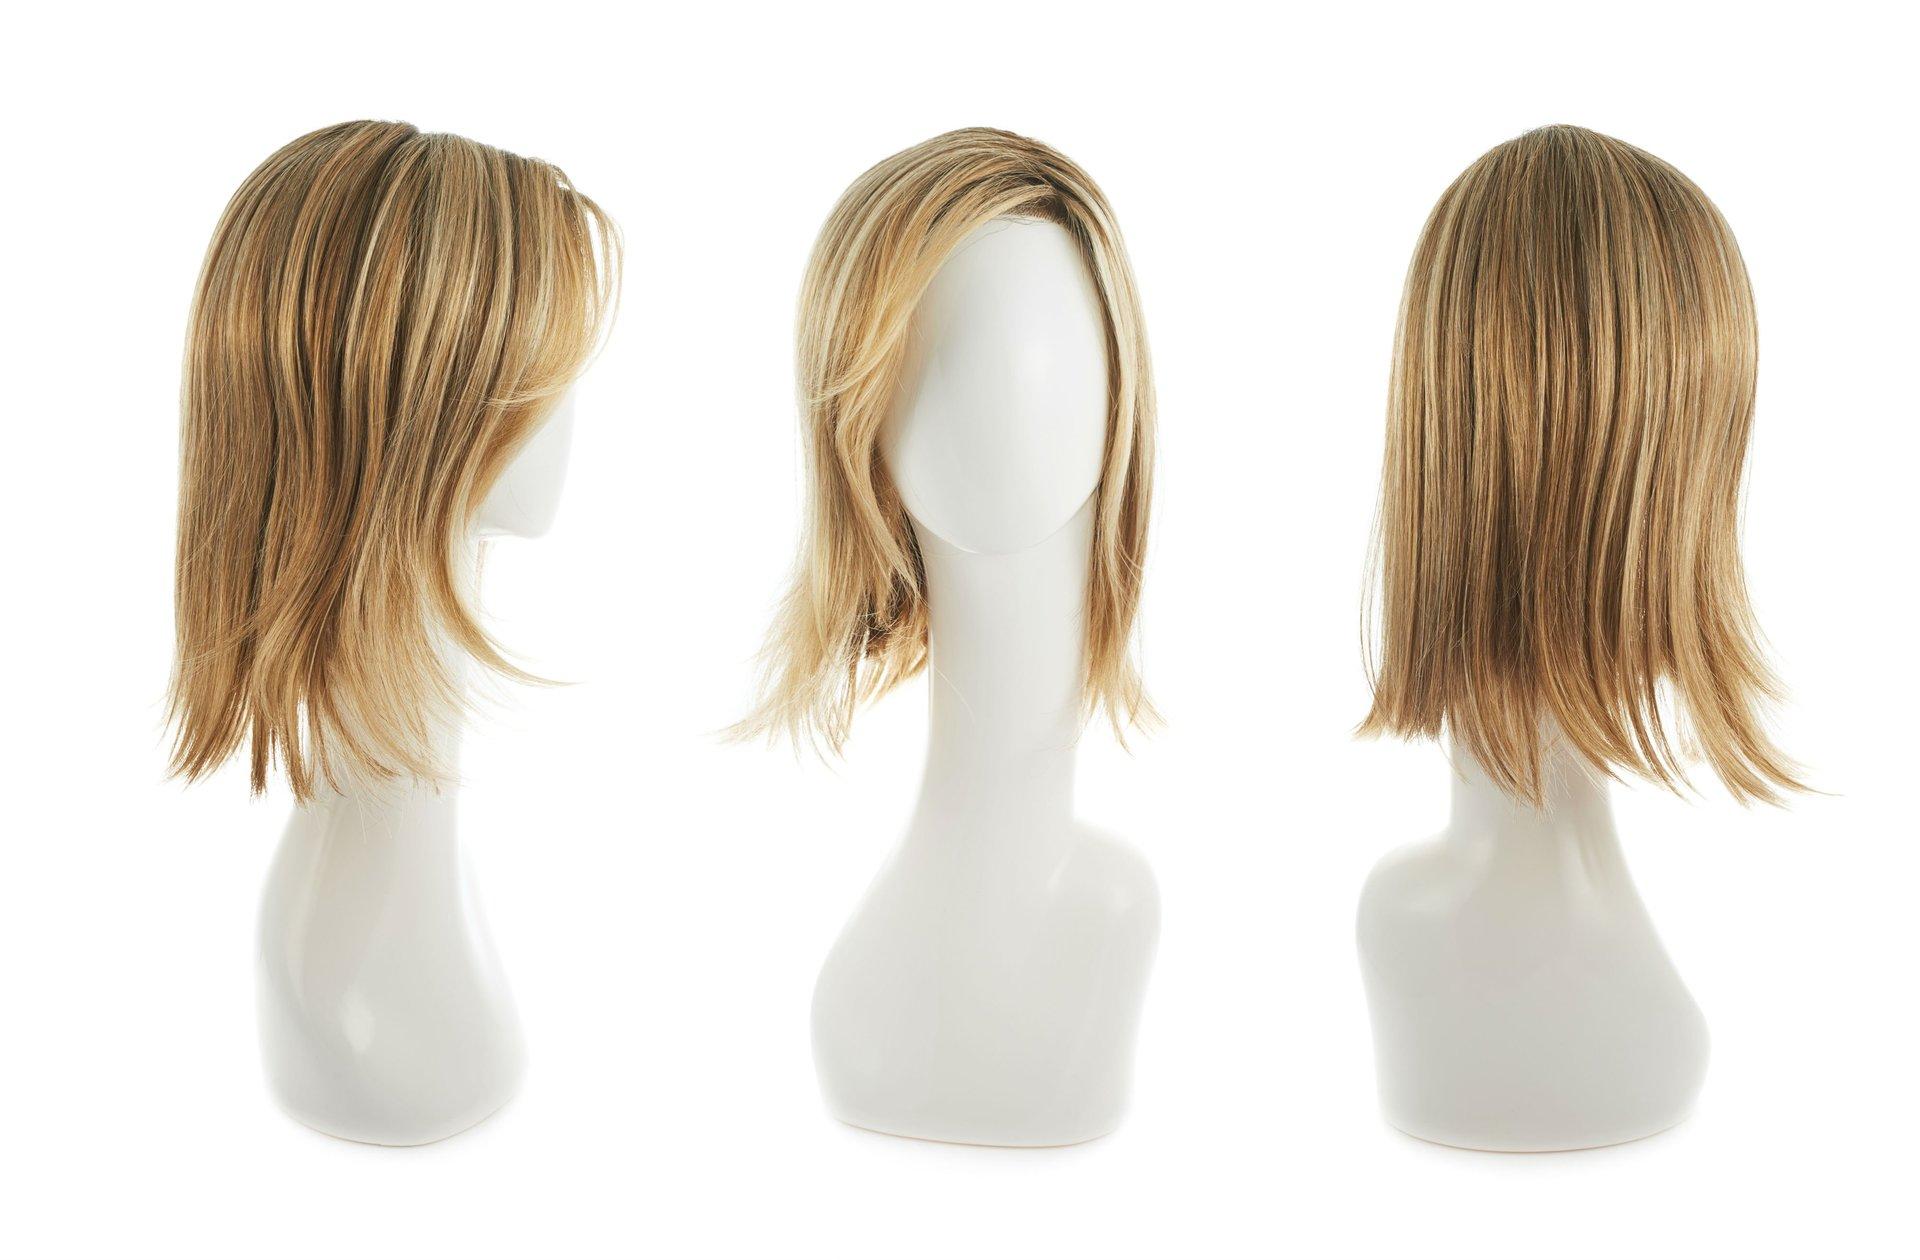 ttre parrucche da donna bionde